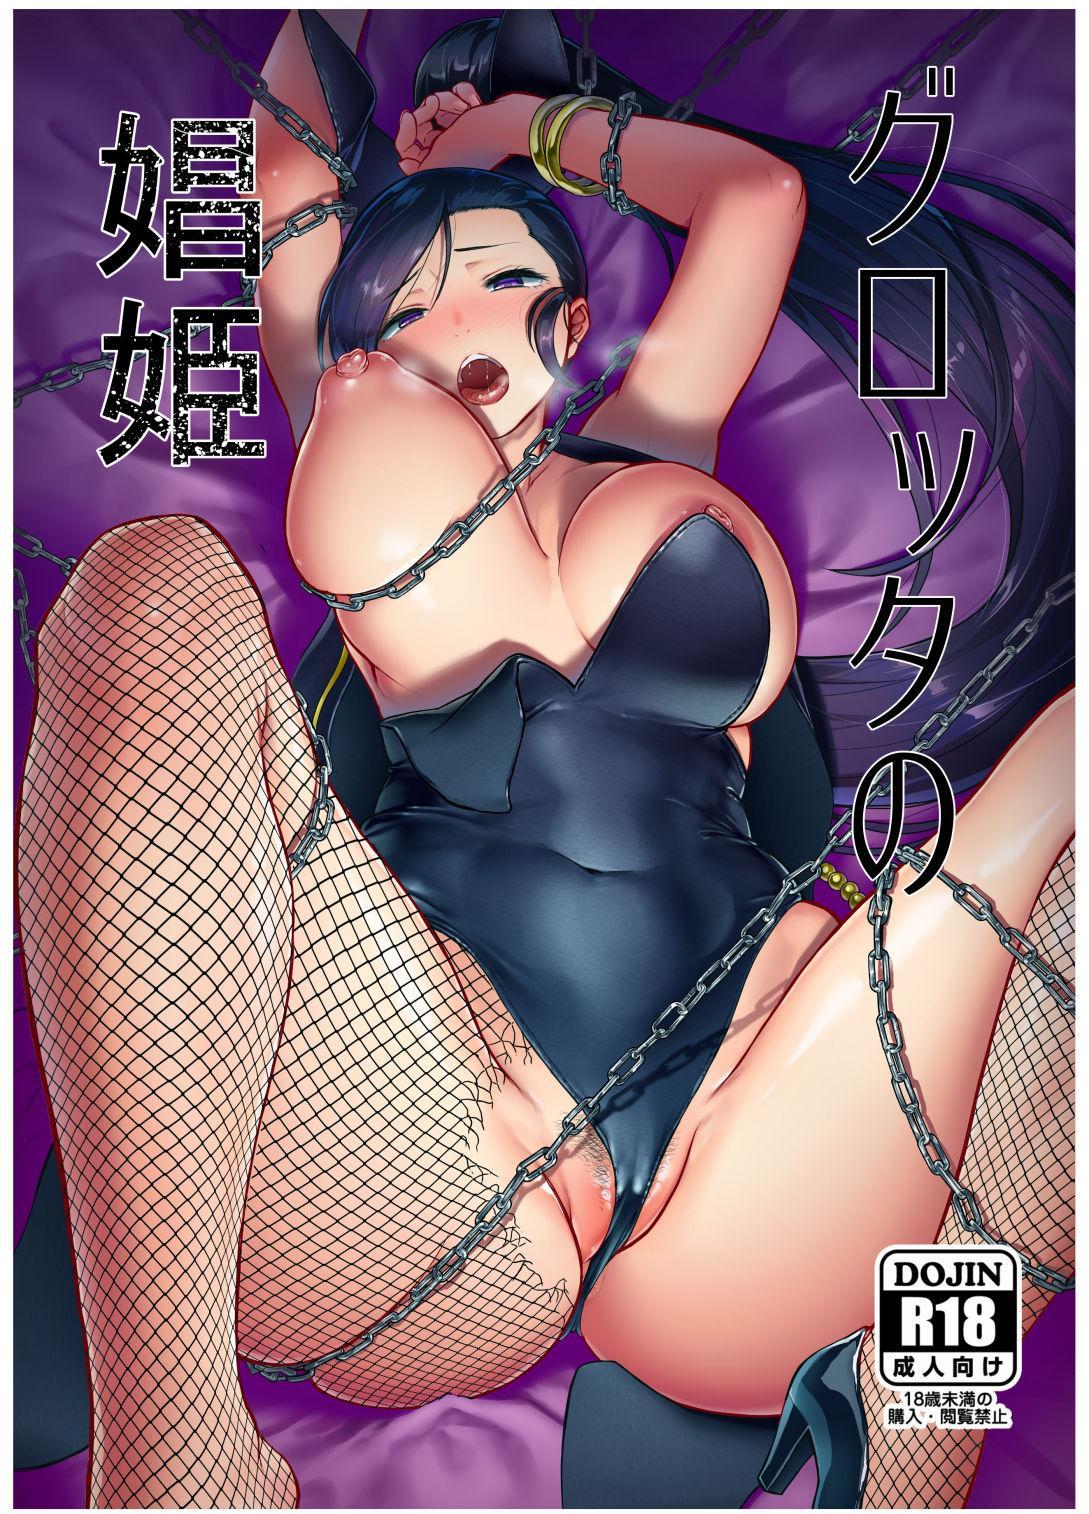 Grotta no Shouki | Octagonia's Prostitute Princess 0